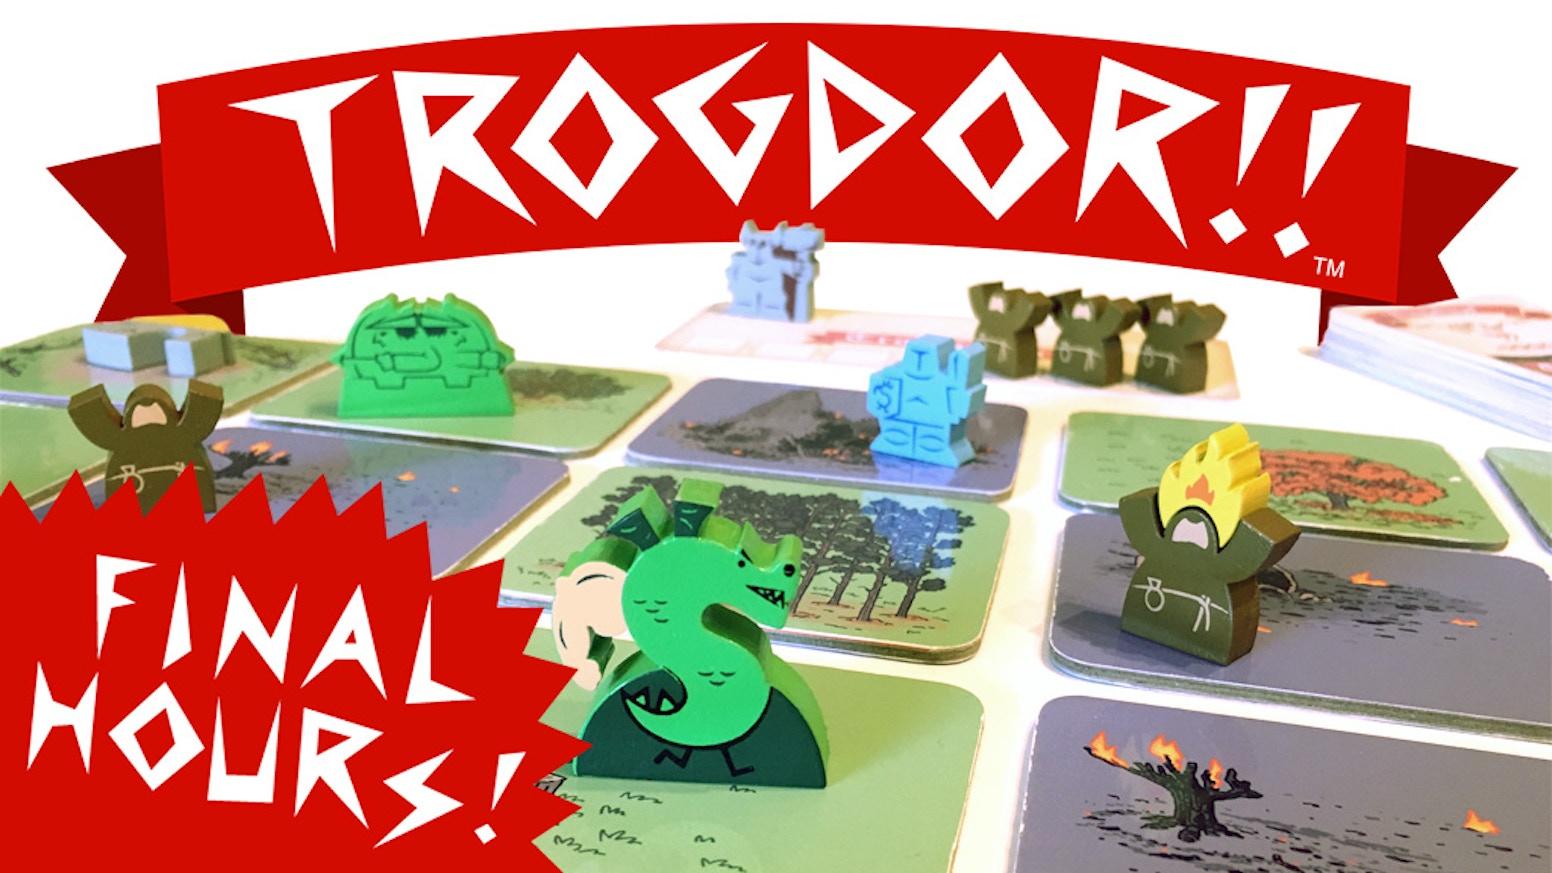 Trogdor The Board Game By Homestar Runner Kickstarter Switch 3 Launch Edition Bonus English Us Games